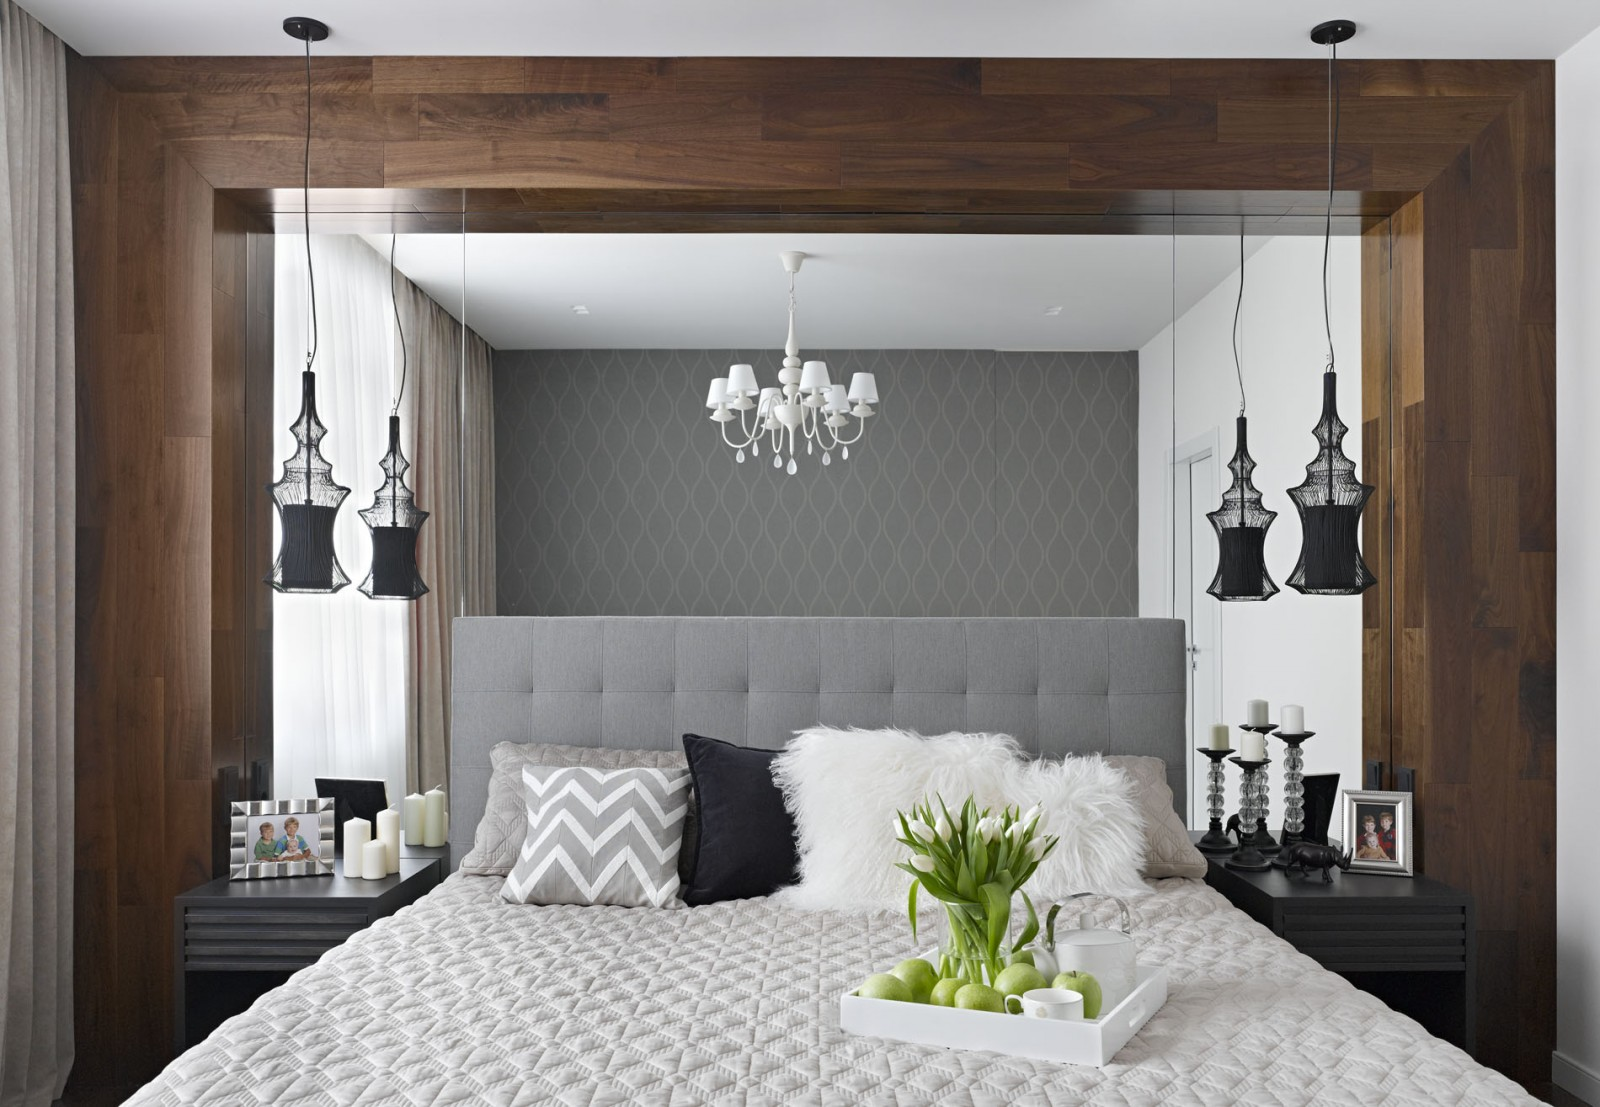 Hiasan bilik tidur kontemporari dengan menggunakan bingkai kayu